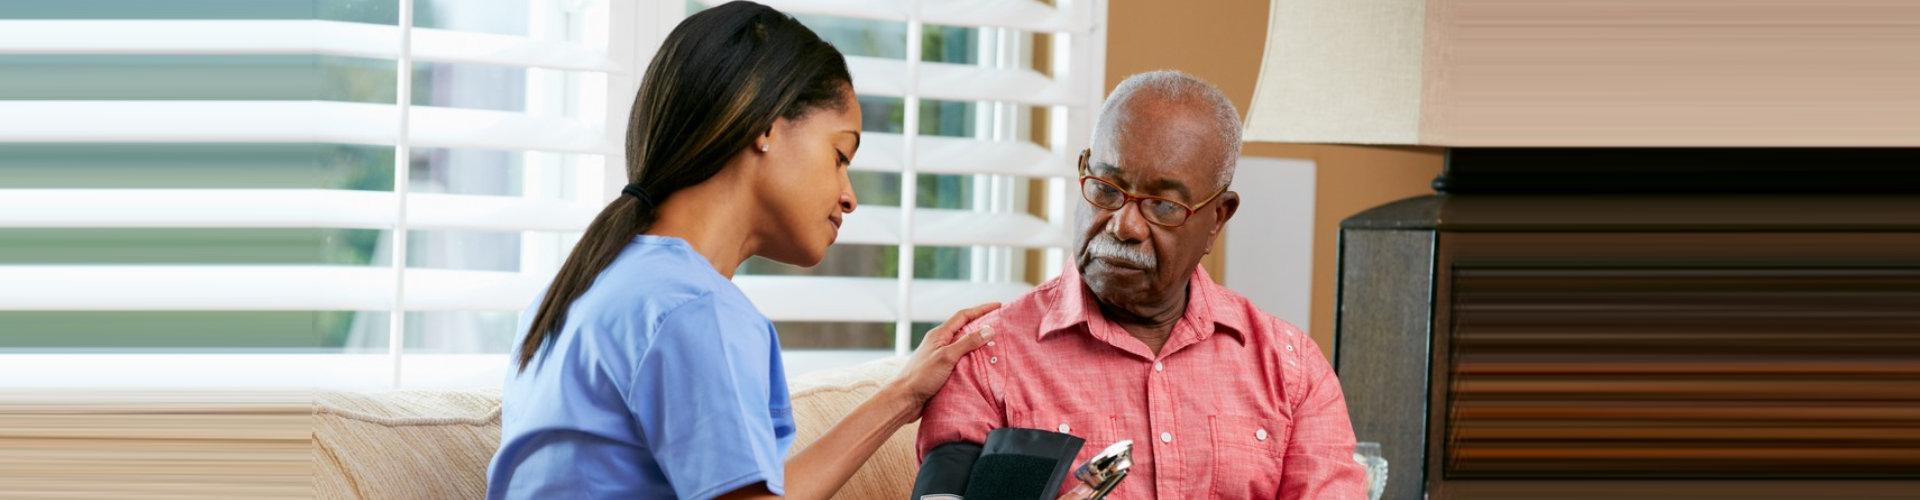 nurse monitoring the health condition of senior man